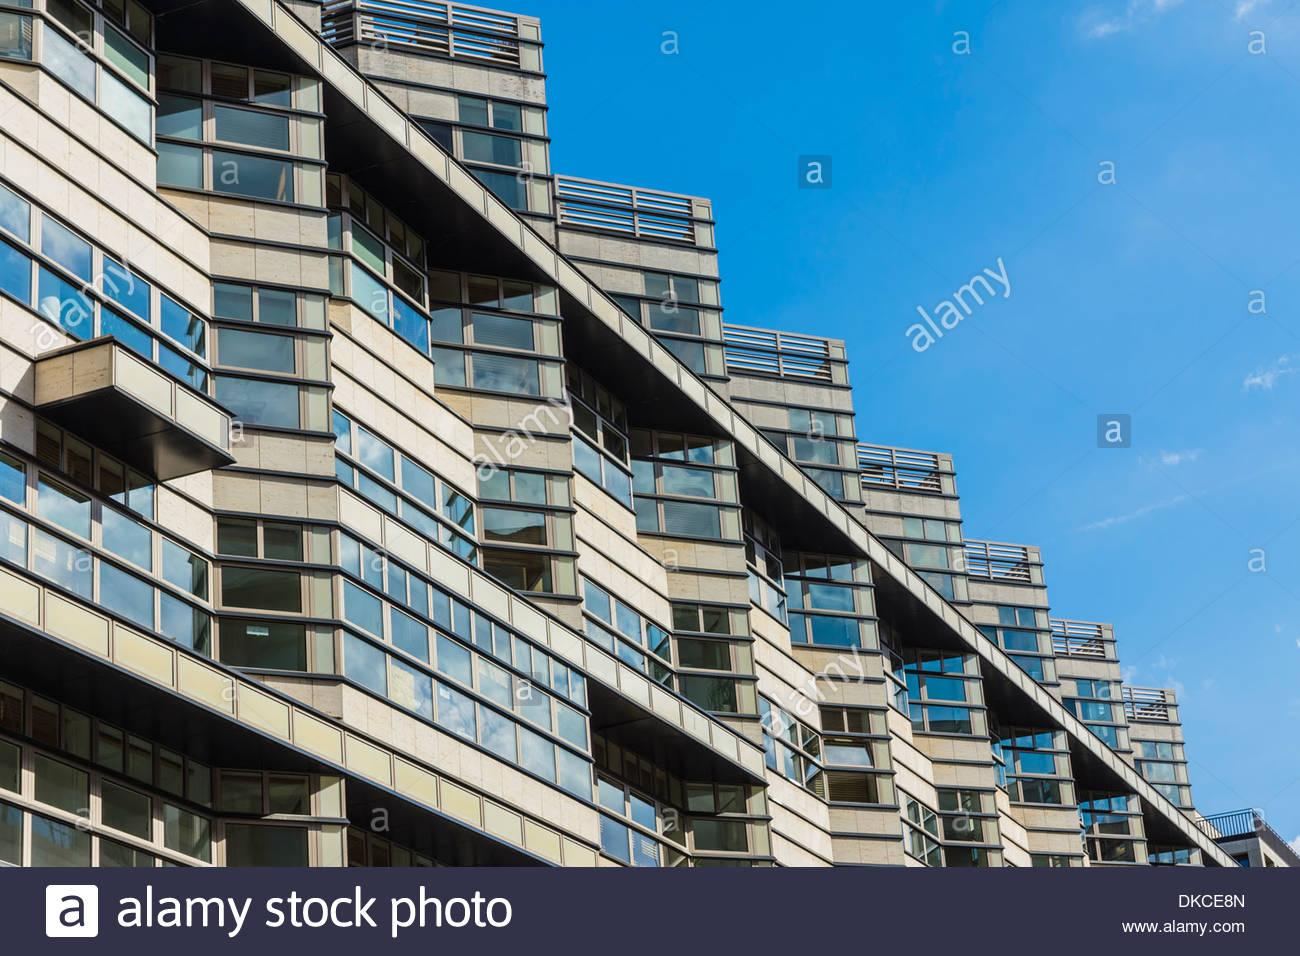 Office buildings, Berlin, Germany - Stock Image